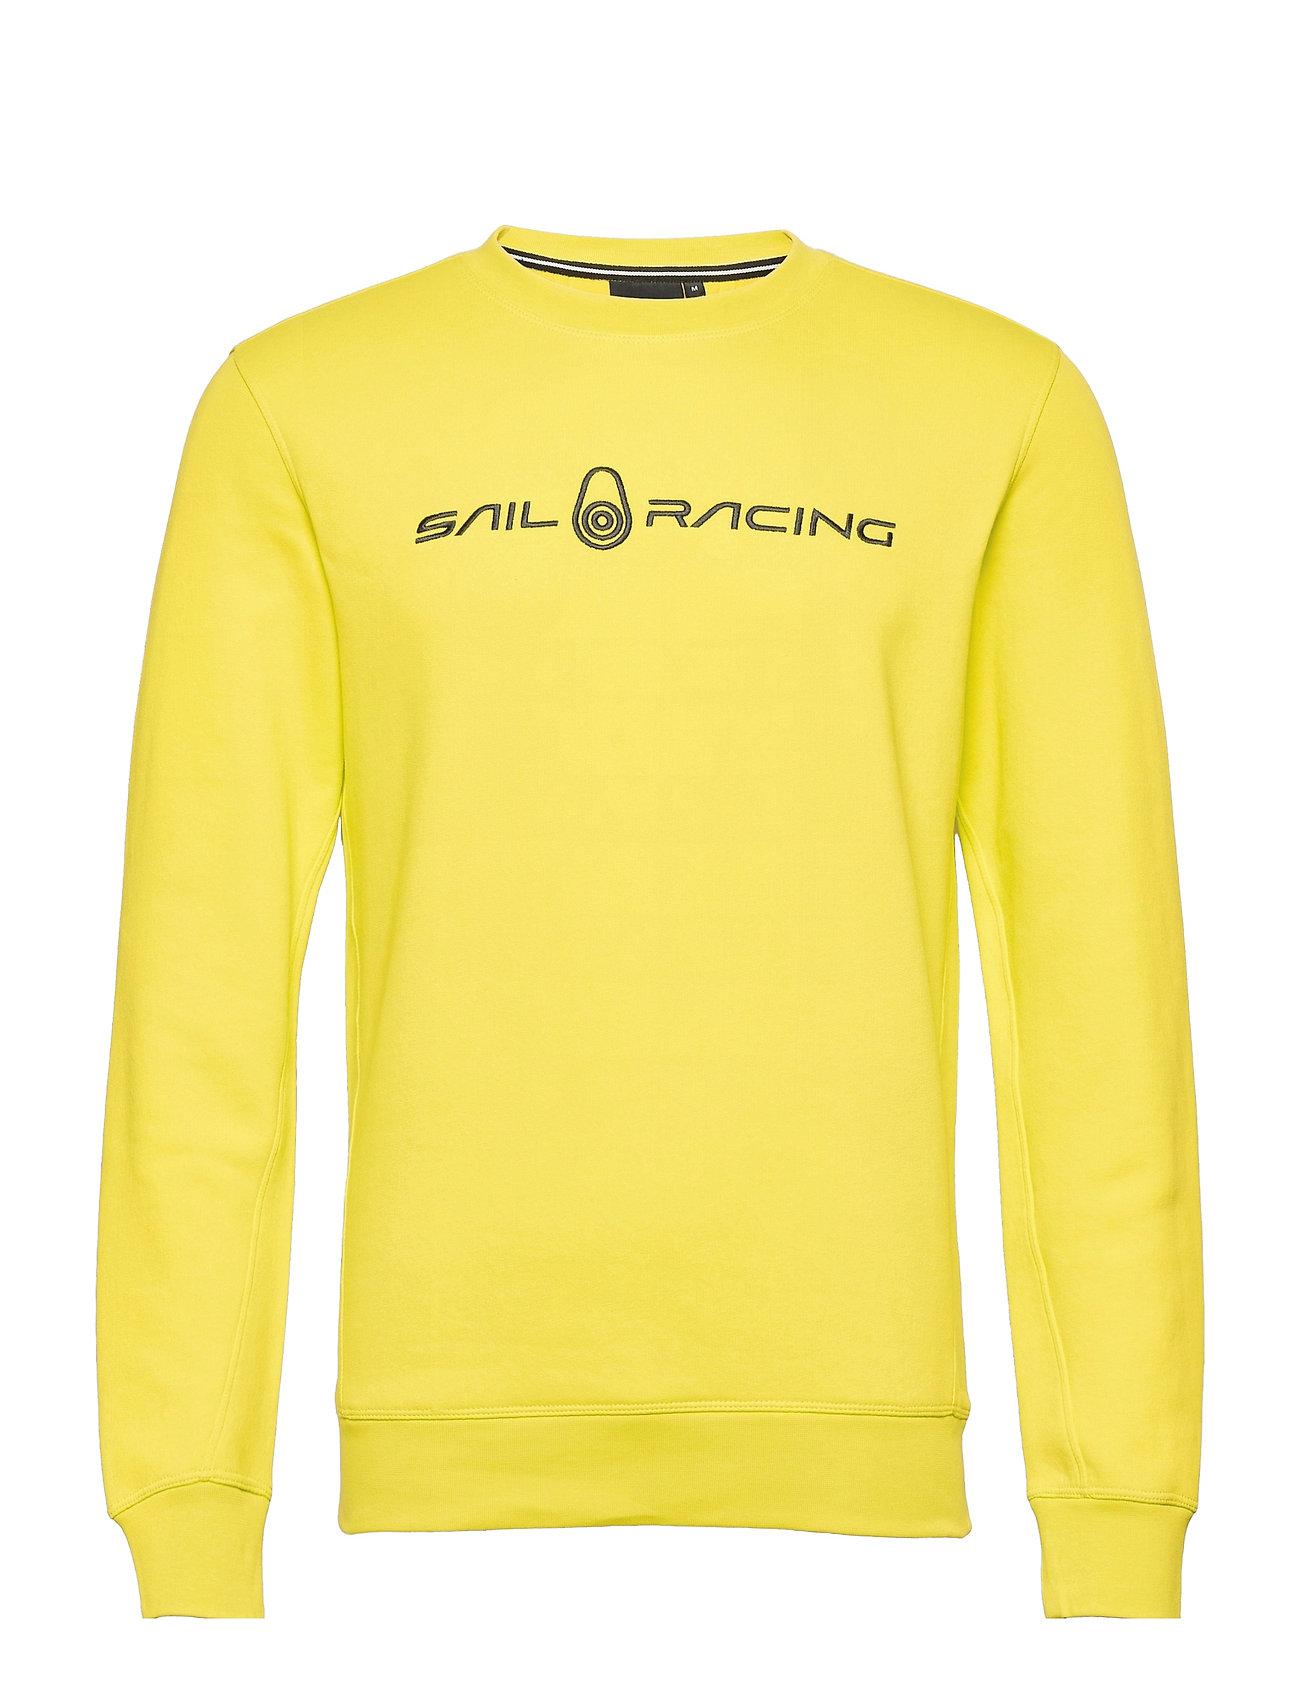 Bowman Sweater Sweatshirt Trøje Gul Sail Racing